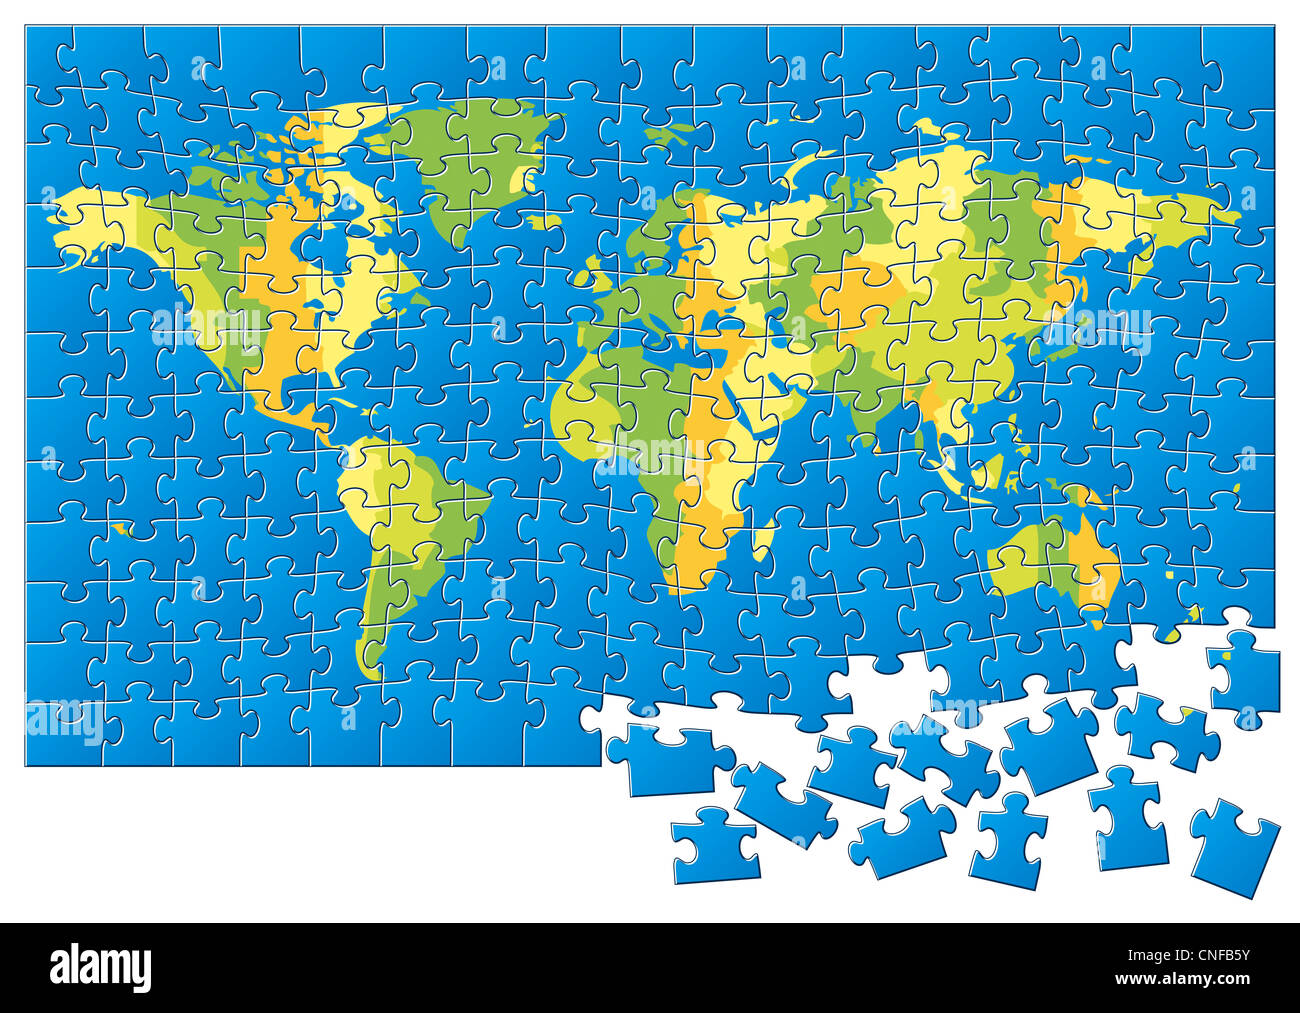 Jigsaw Puzzle World Map Stock Photos & Jigsaw Puzzle World ...